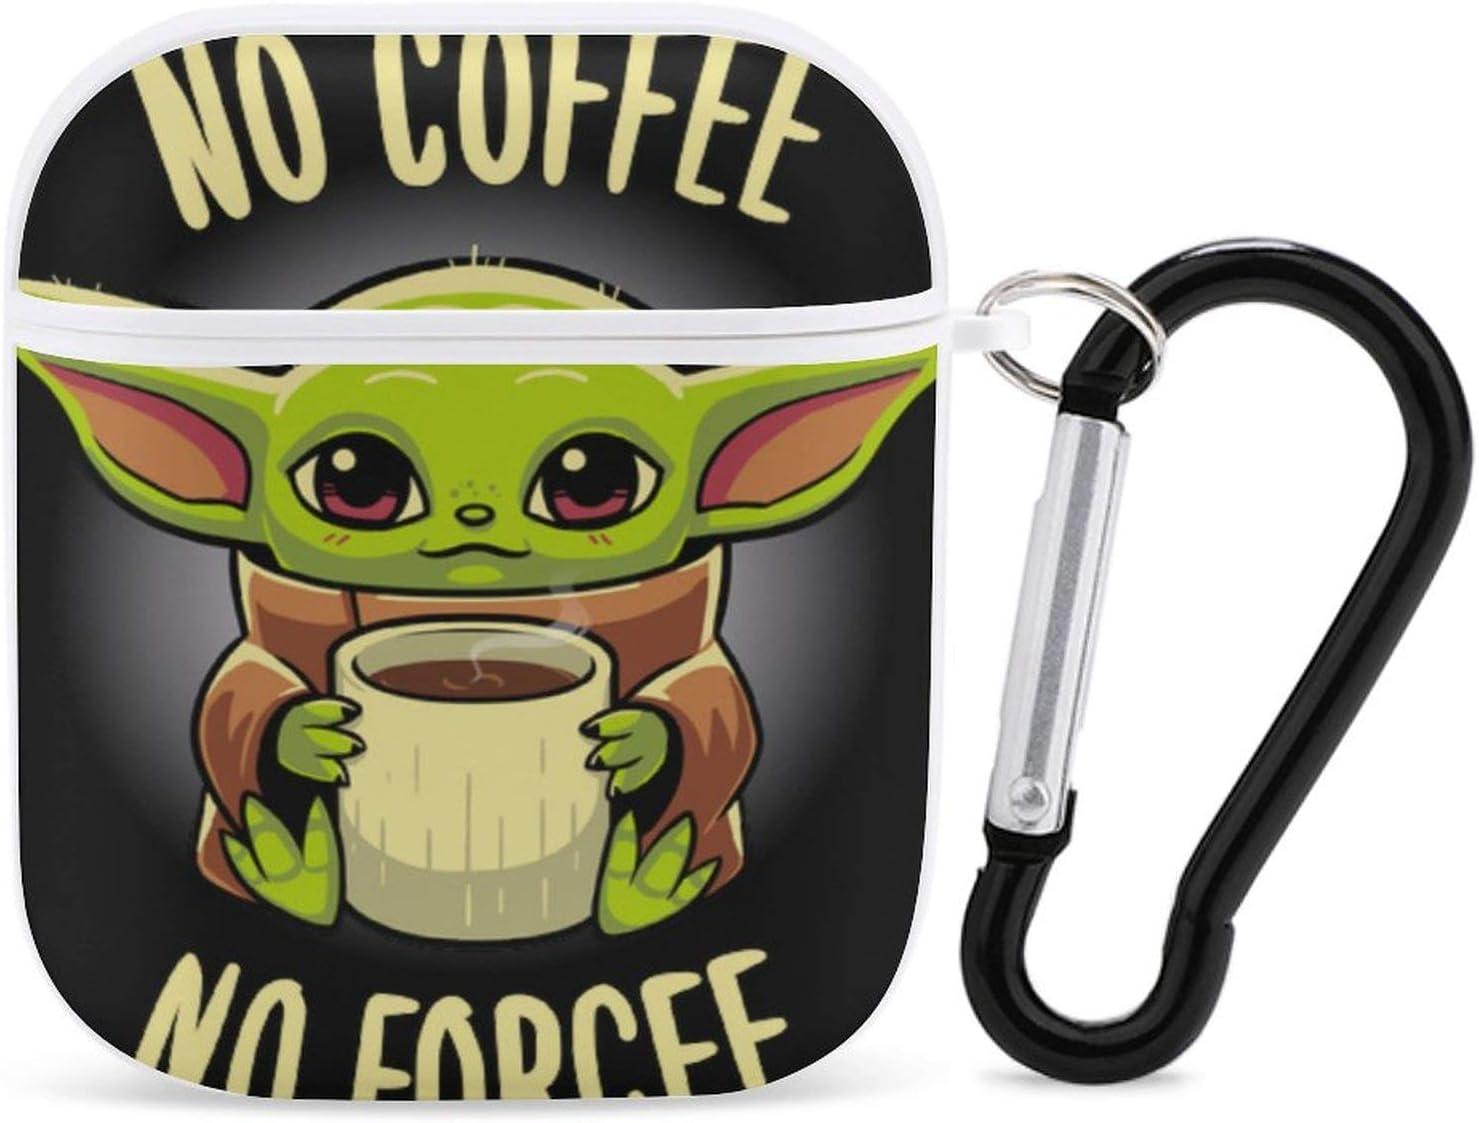 Ba-by Yo-da Man-dalorian Apple Airpods Bluetooth Headset Case Cover,Cute Matte Black Airpods Cover Case,Earphone Wireless Charging Case Cover for Apple Airpods 2&1